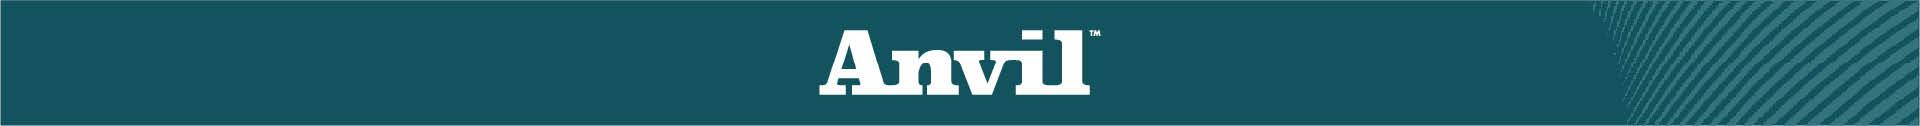 StyleWell Brand Banner